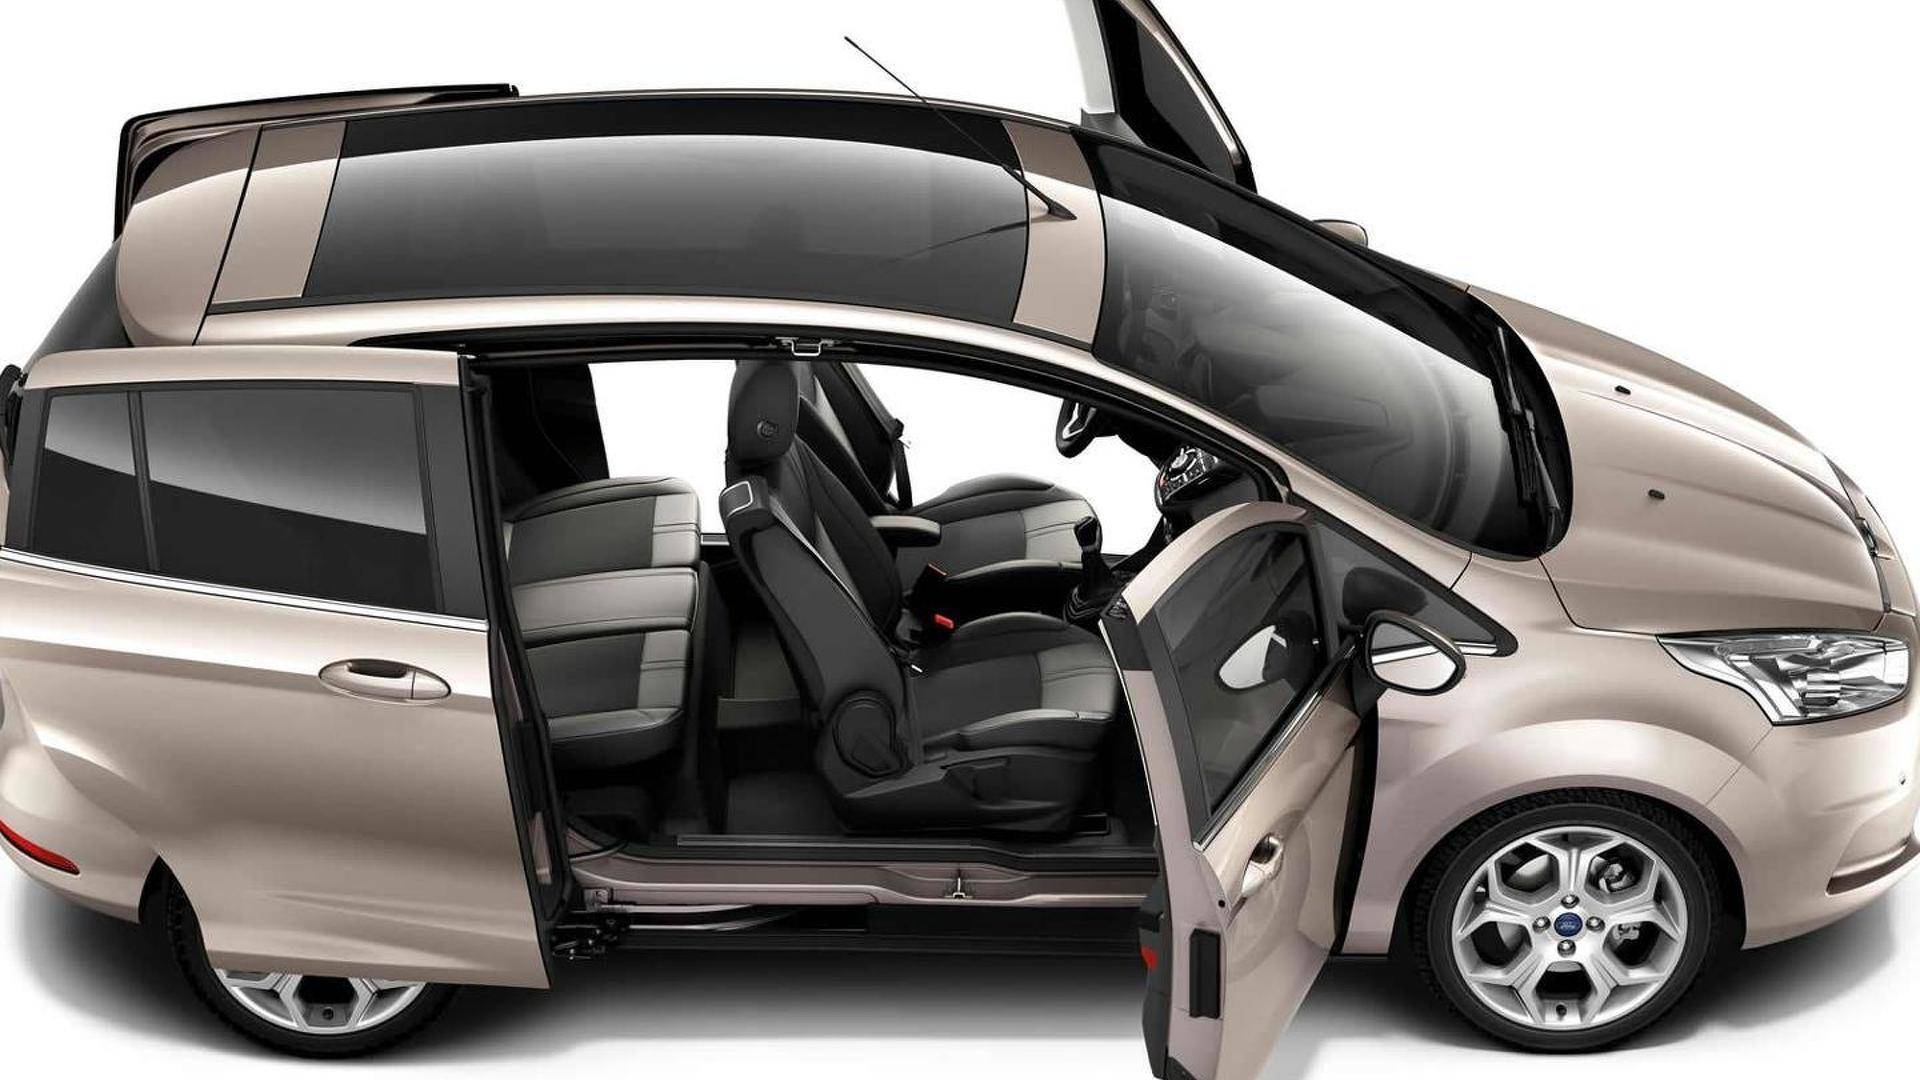 Ford B Max Sliding Doors Reveal Pillarless Design